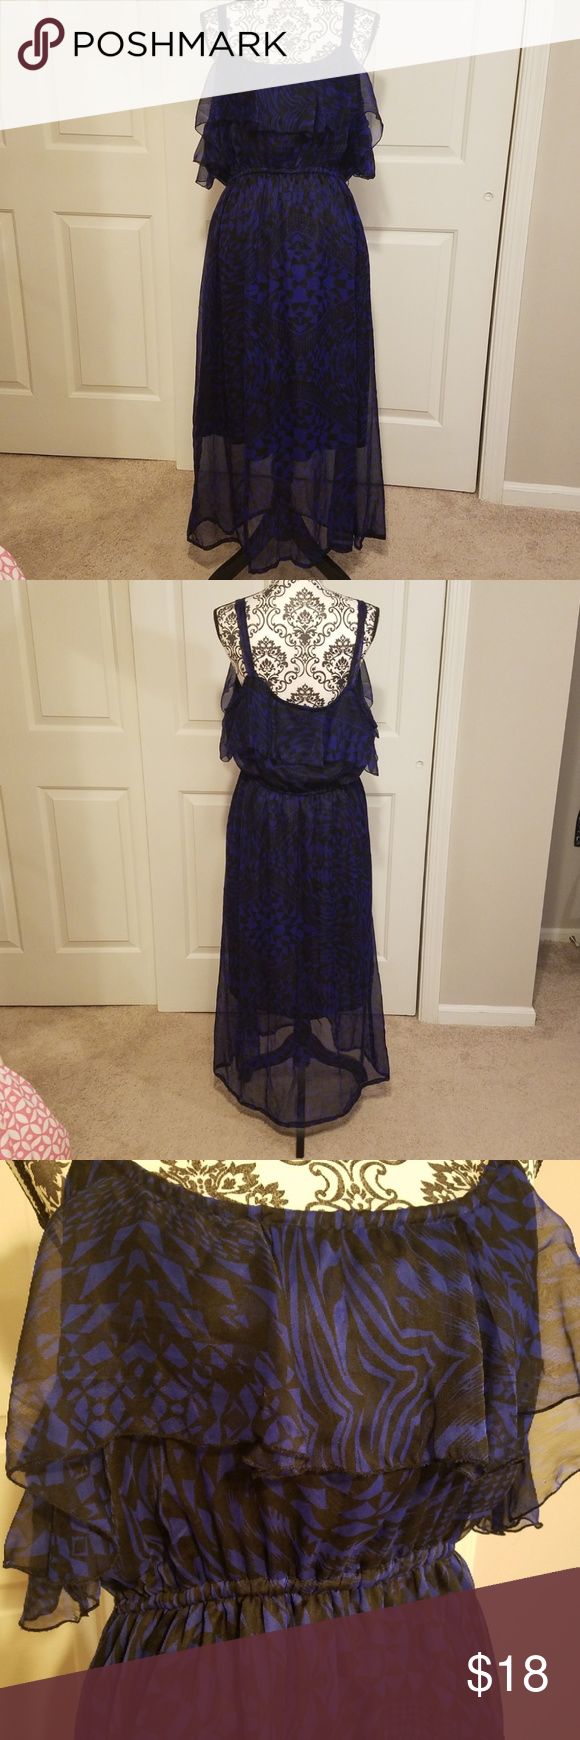 Lepogee Maxi Dress Plus Size 3x Plus Size Maxi Dresses Maxi Dress Dresses [ 1740 x 580 Pixel ]